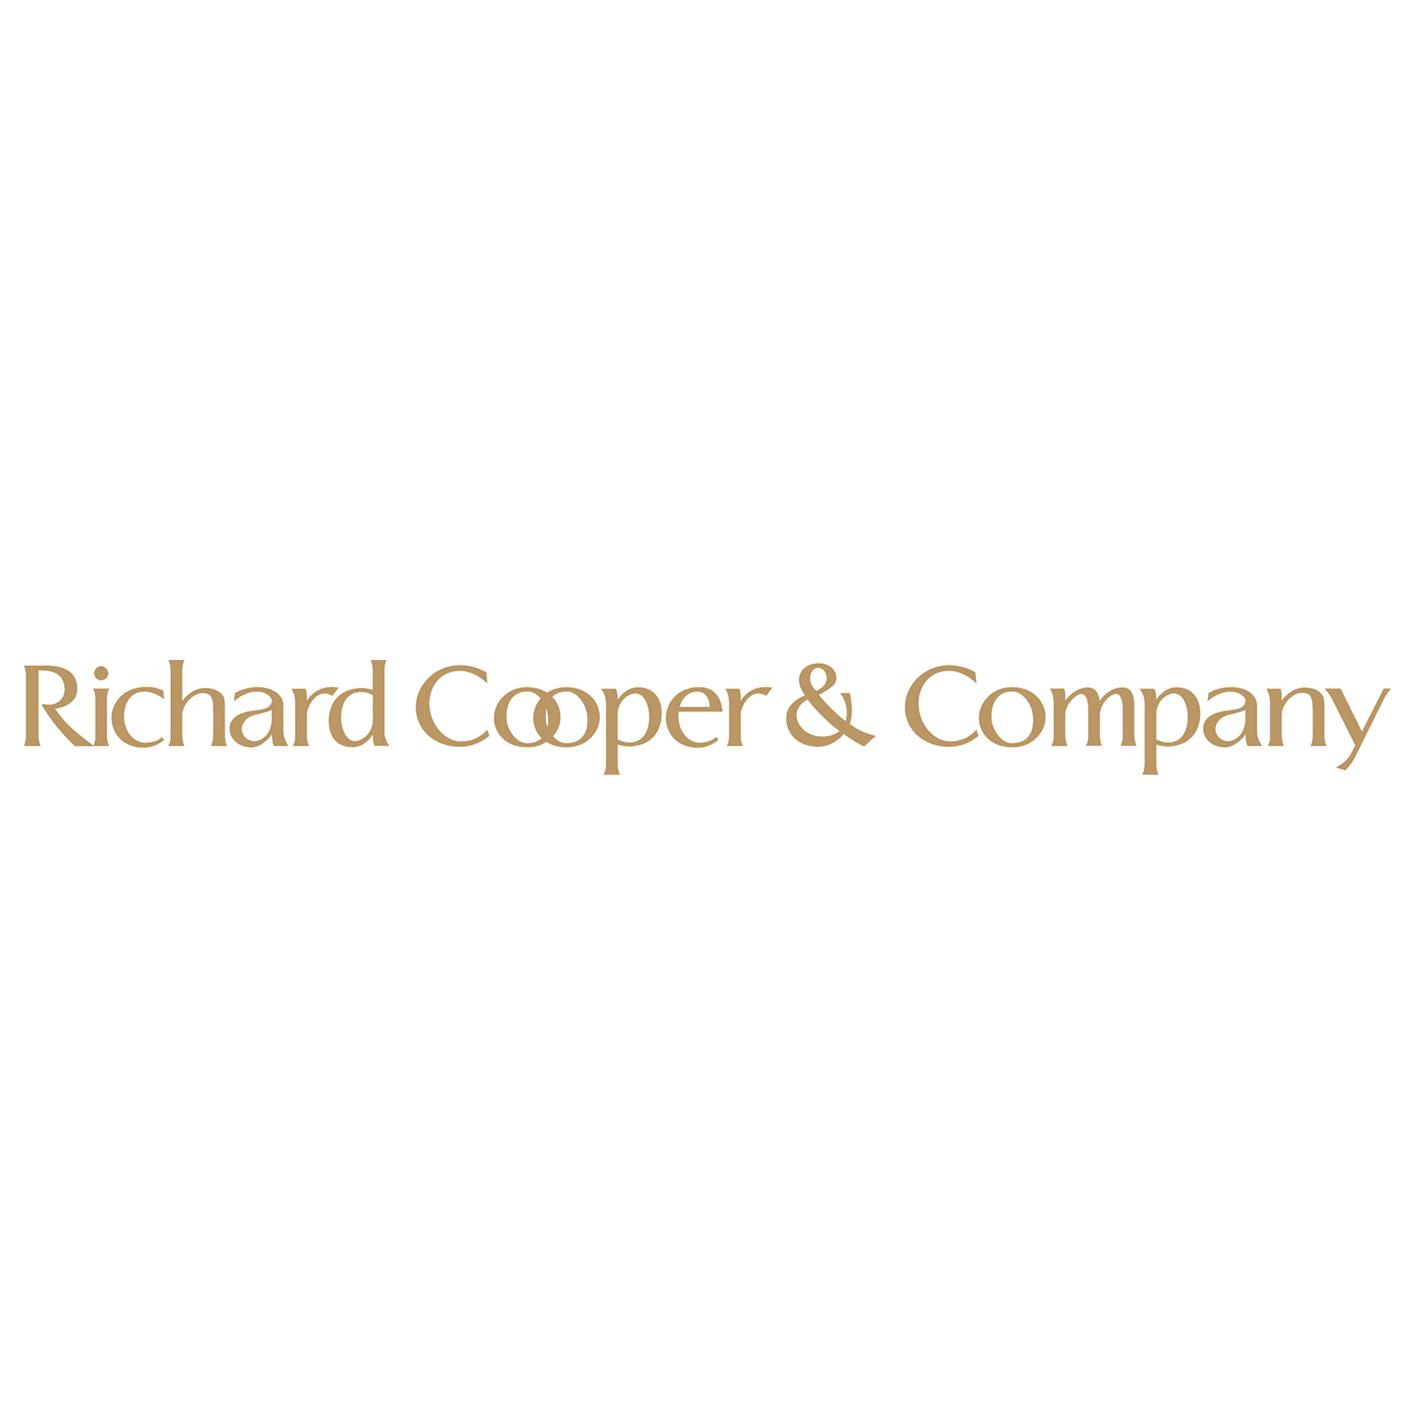 Richard Cooper Bronze Ltd